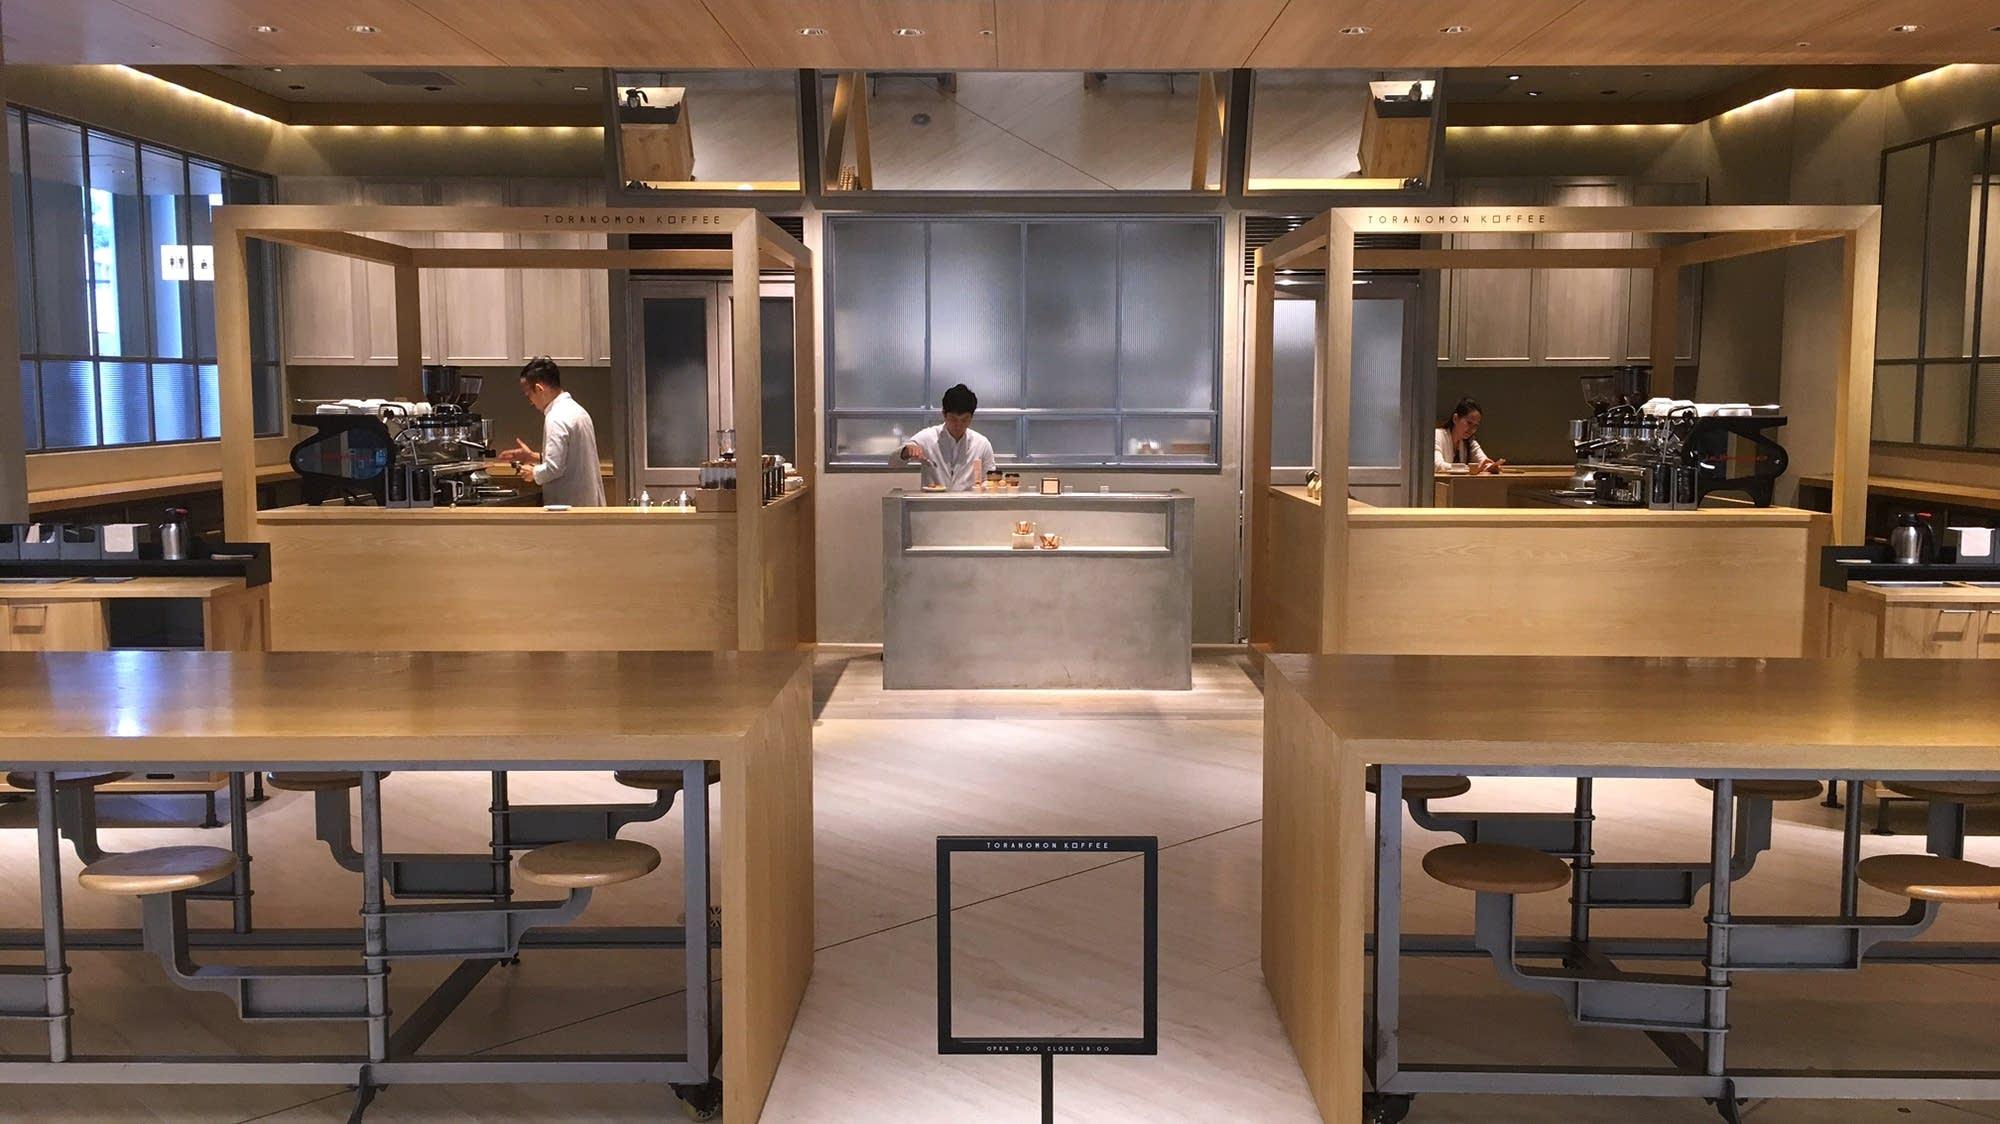 Toromonon Koffee, Tokyo, Japan